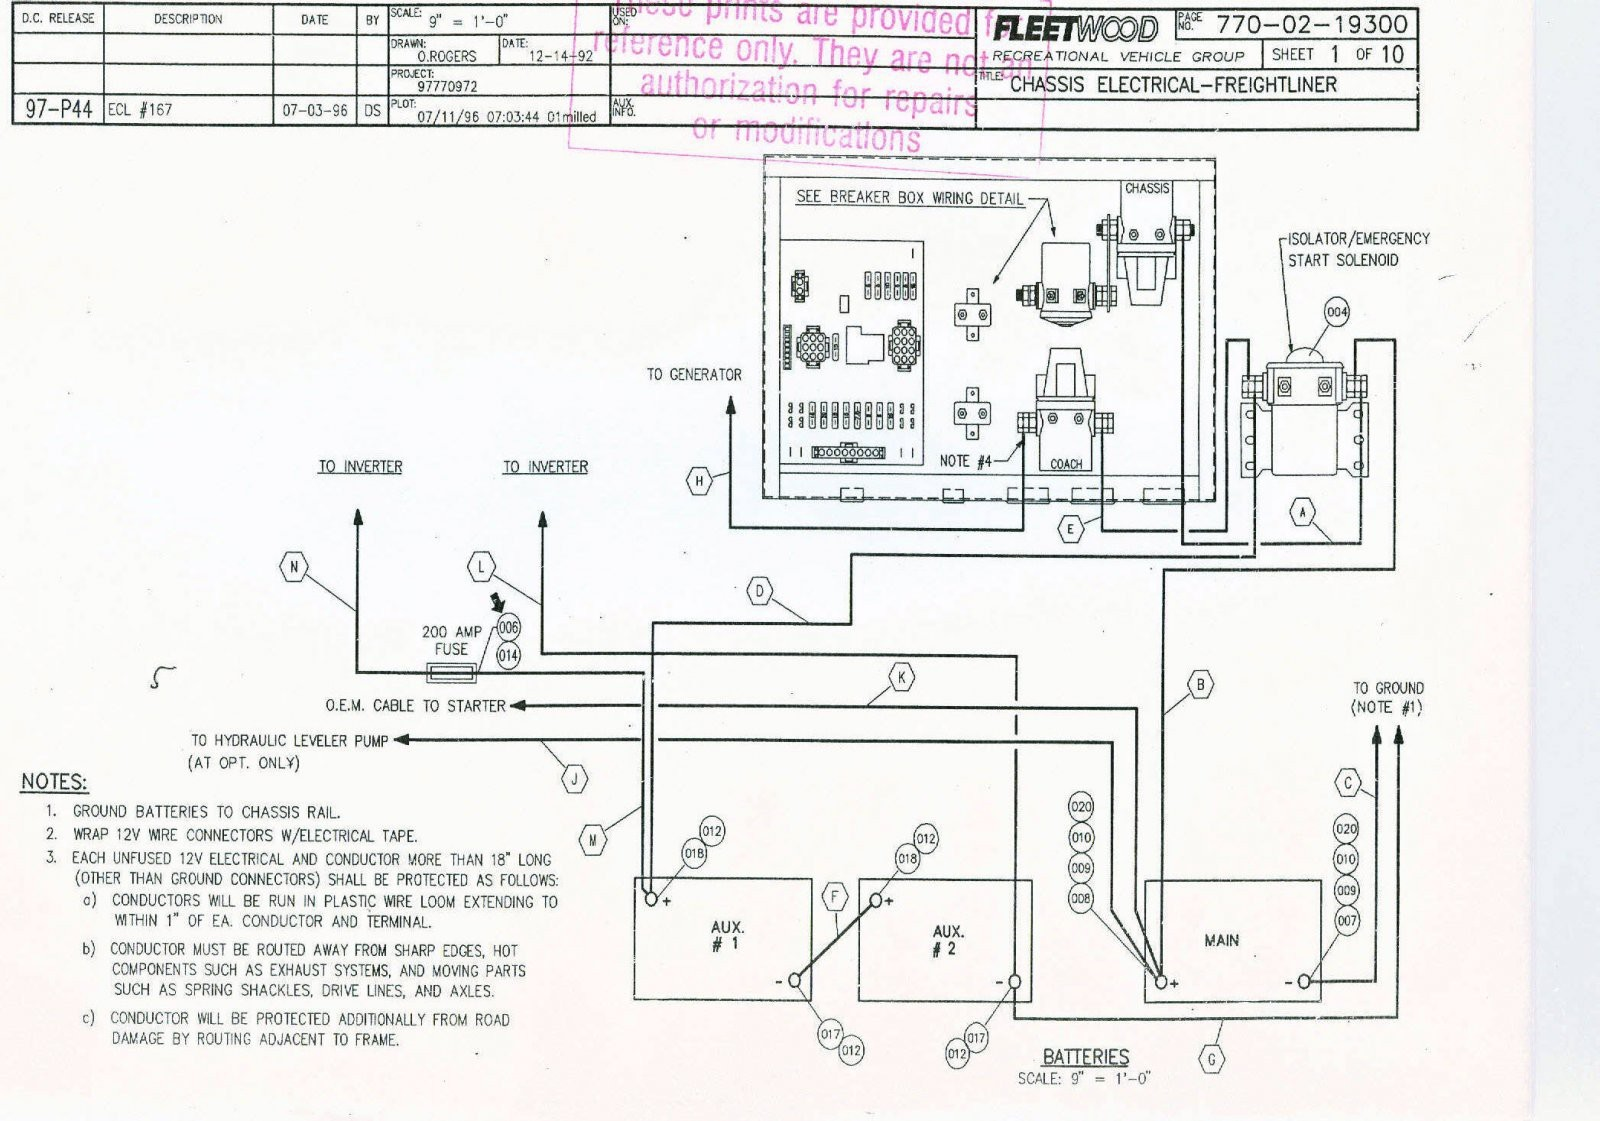 DIAGRAM] 1990 Fleetwood Southwind Wiring Diagram Turn Signal FULL Version  HD Quality Turn Signal - STRUCTUREDSETTLEME.NIBERMA.FR structuredsettleme.niberma.fr